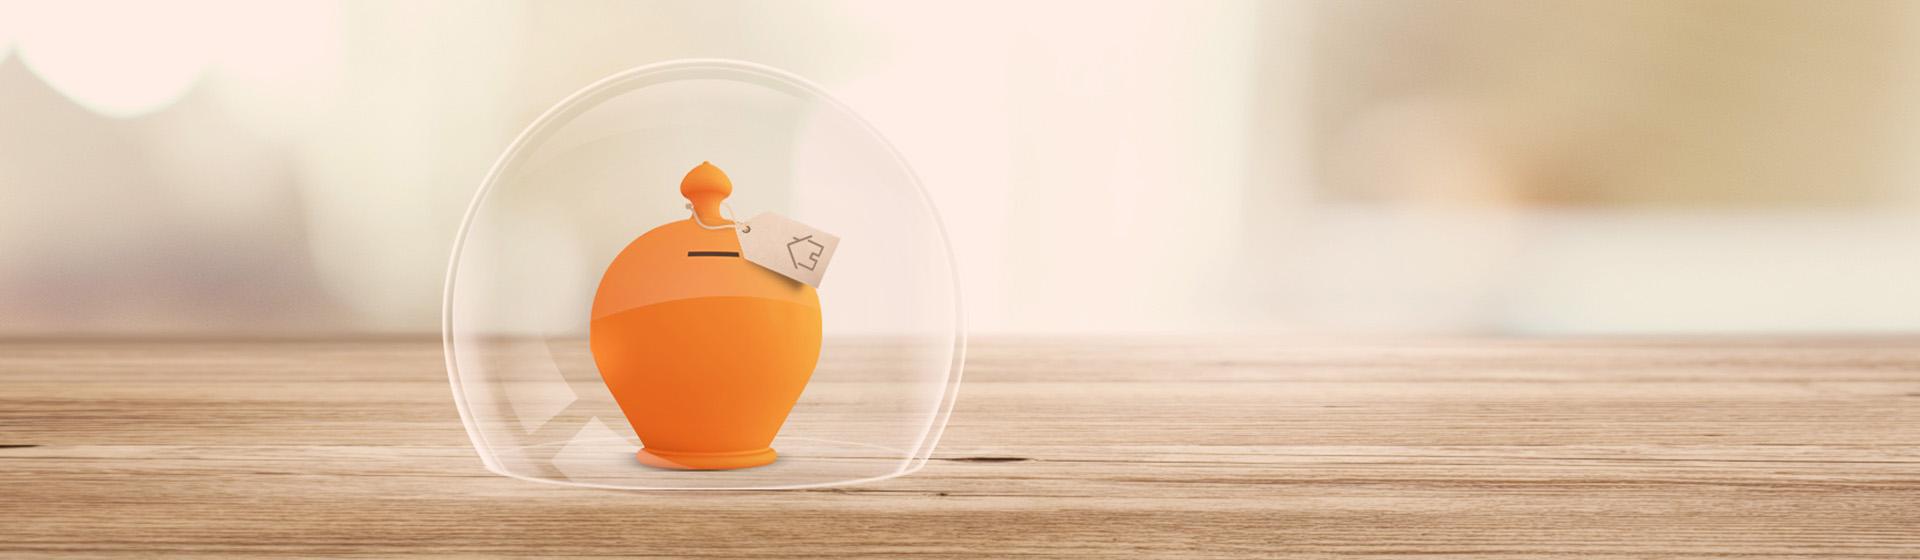 Loan repayment insurance